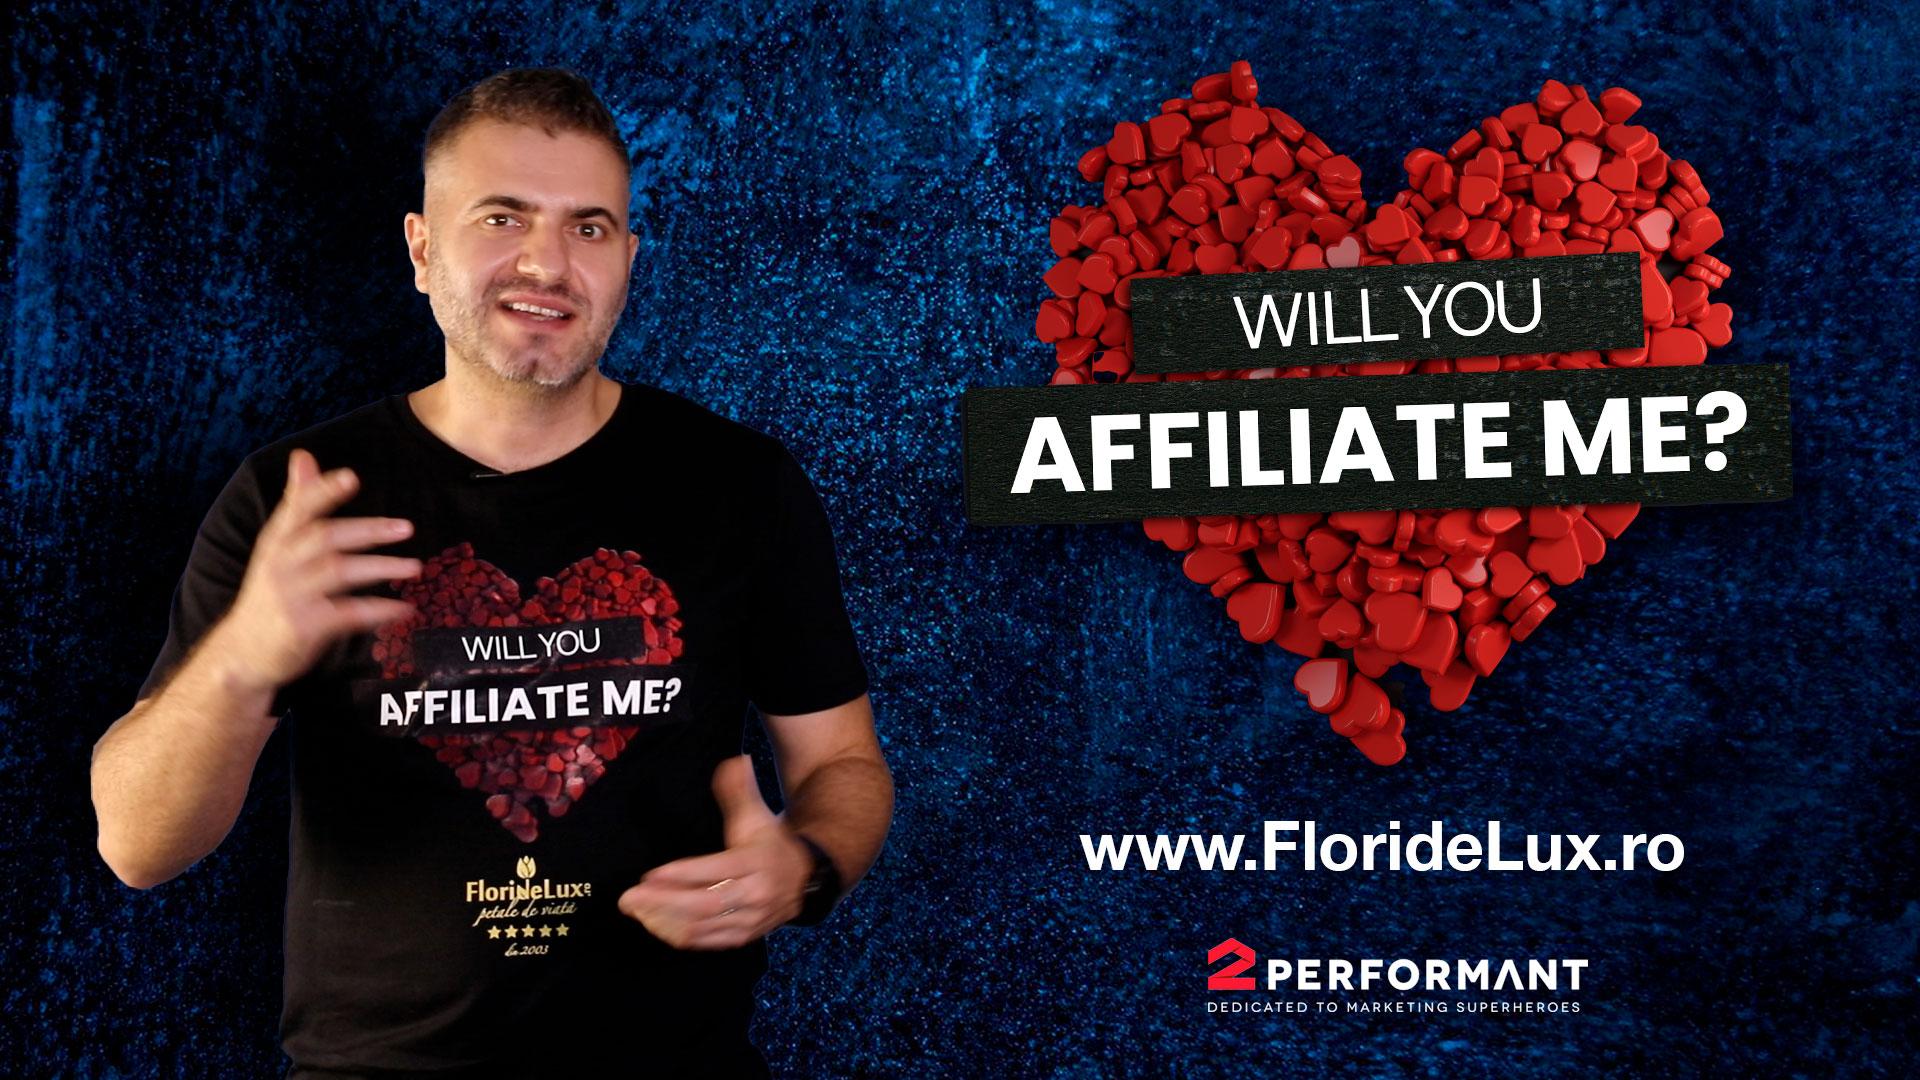 Will you affiliate me? Program de afiliere FlorideLux.ro in reteaua 2Performant.ro